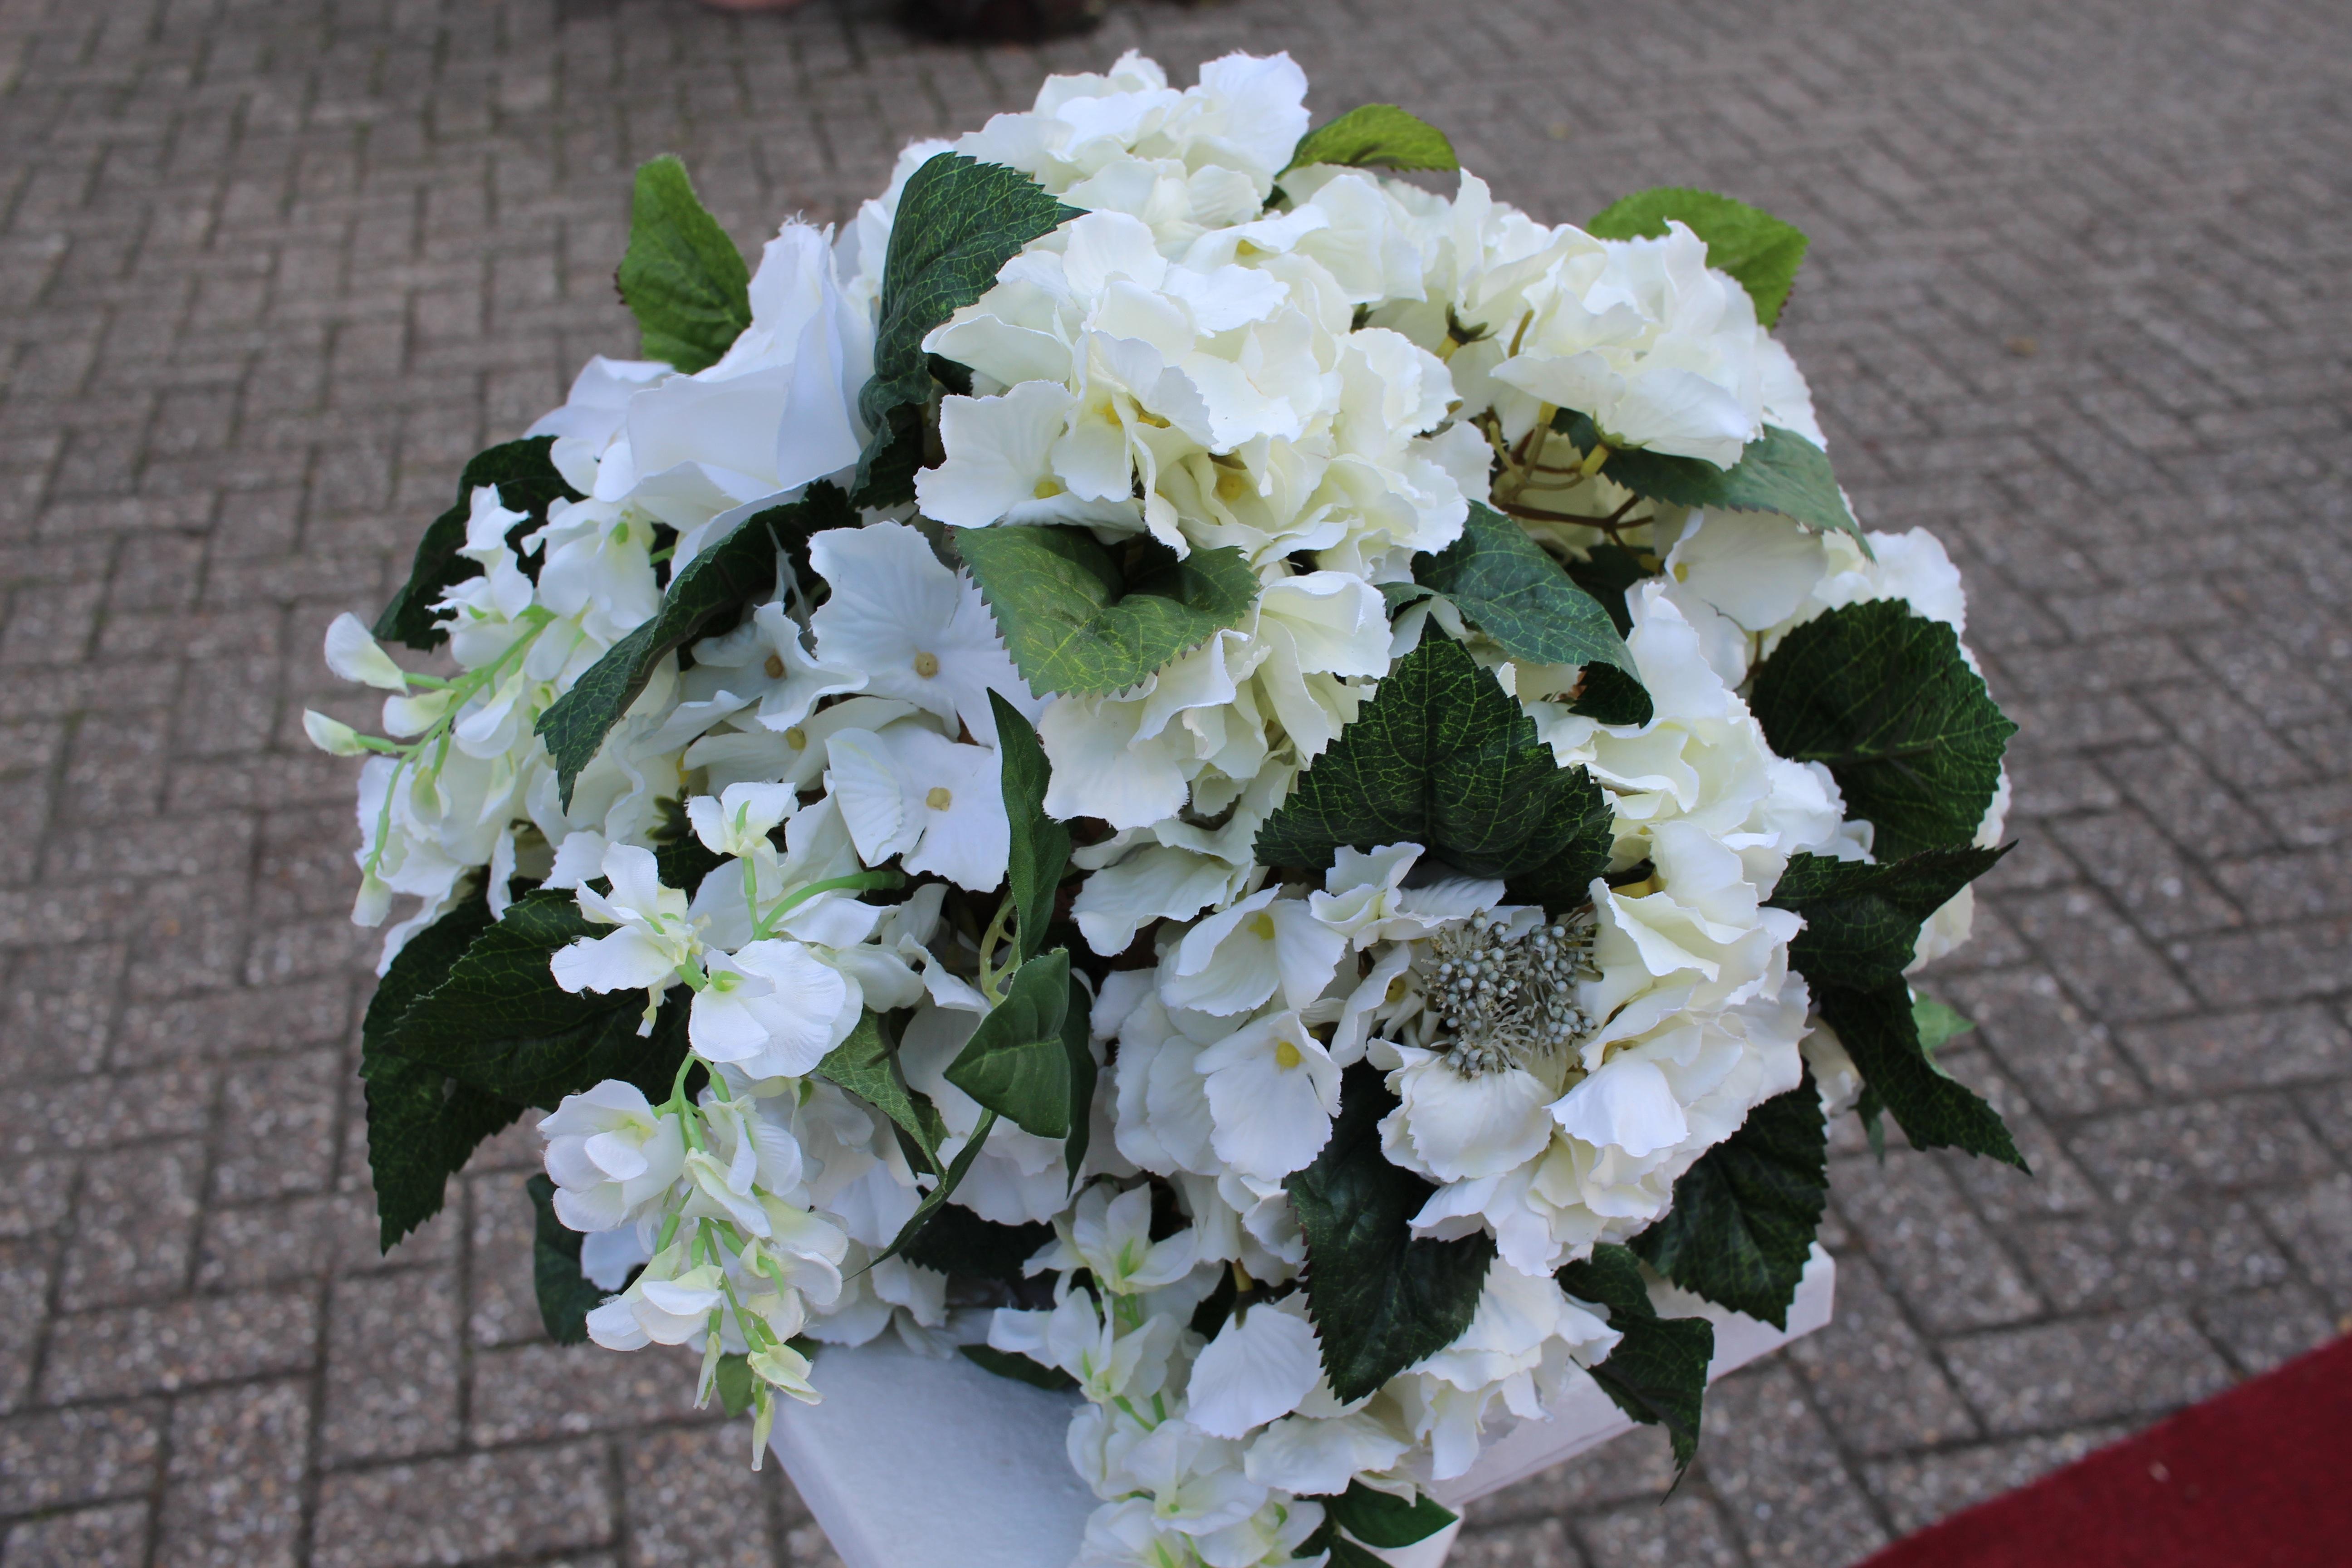 fotos gratis naturaleza celebracion amor regalo decoracin romntico boda matrimonio flora hortensia festivo deco da de la boda creatividad